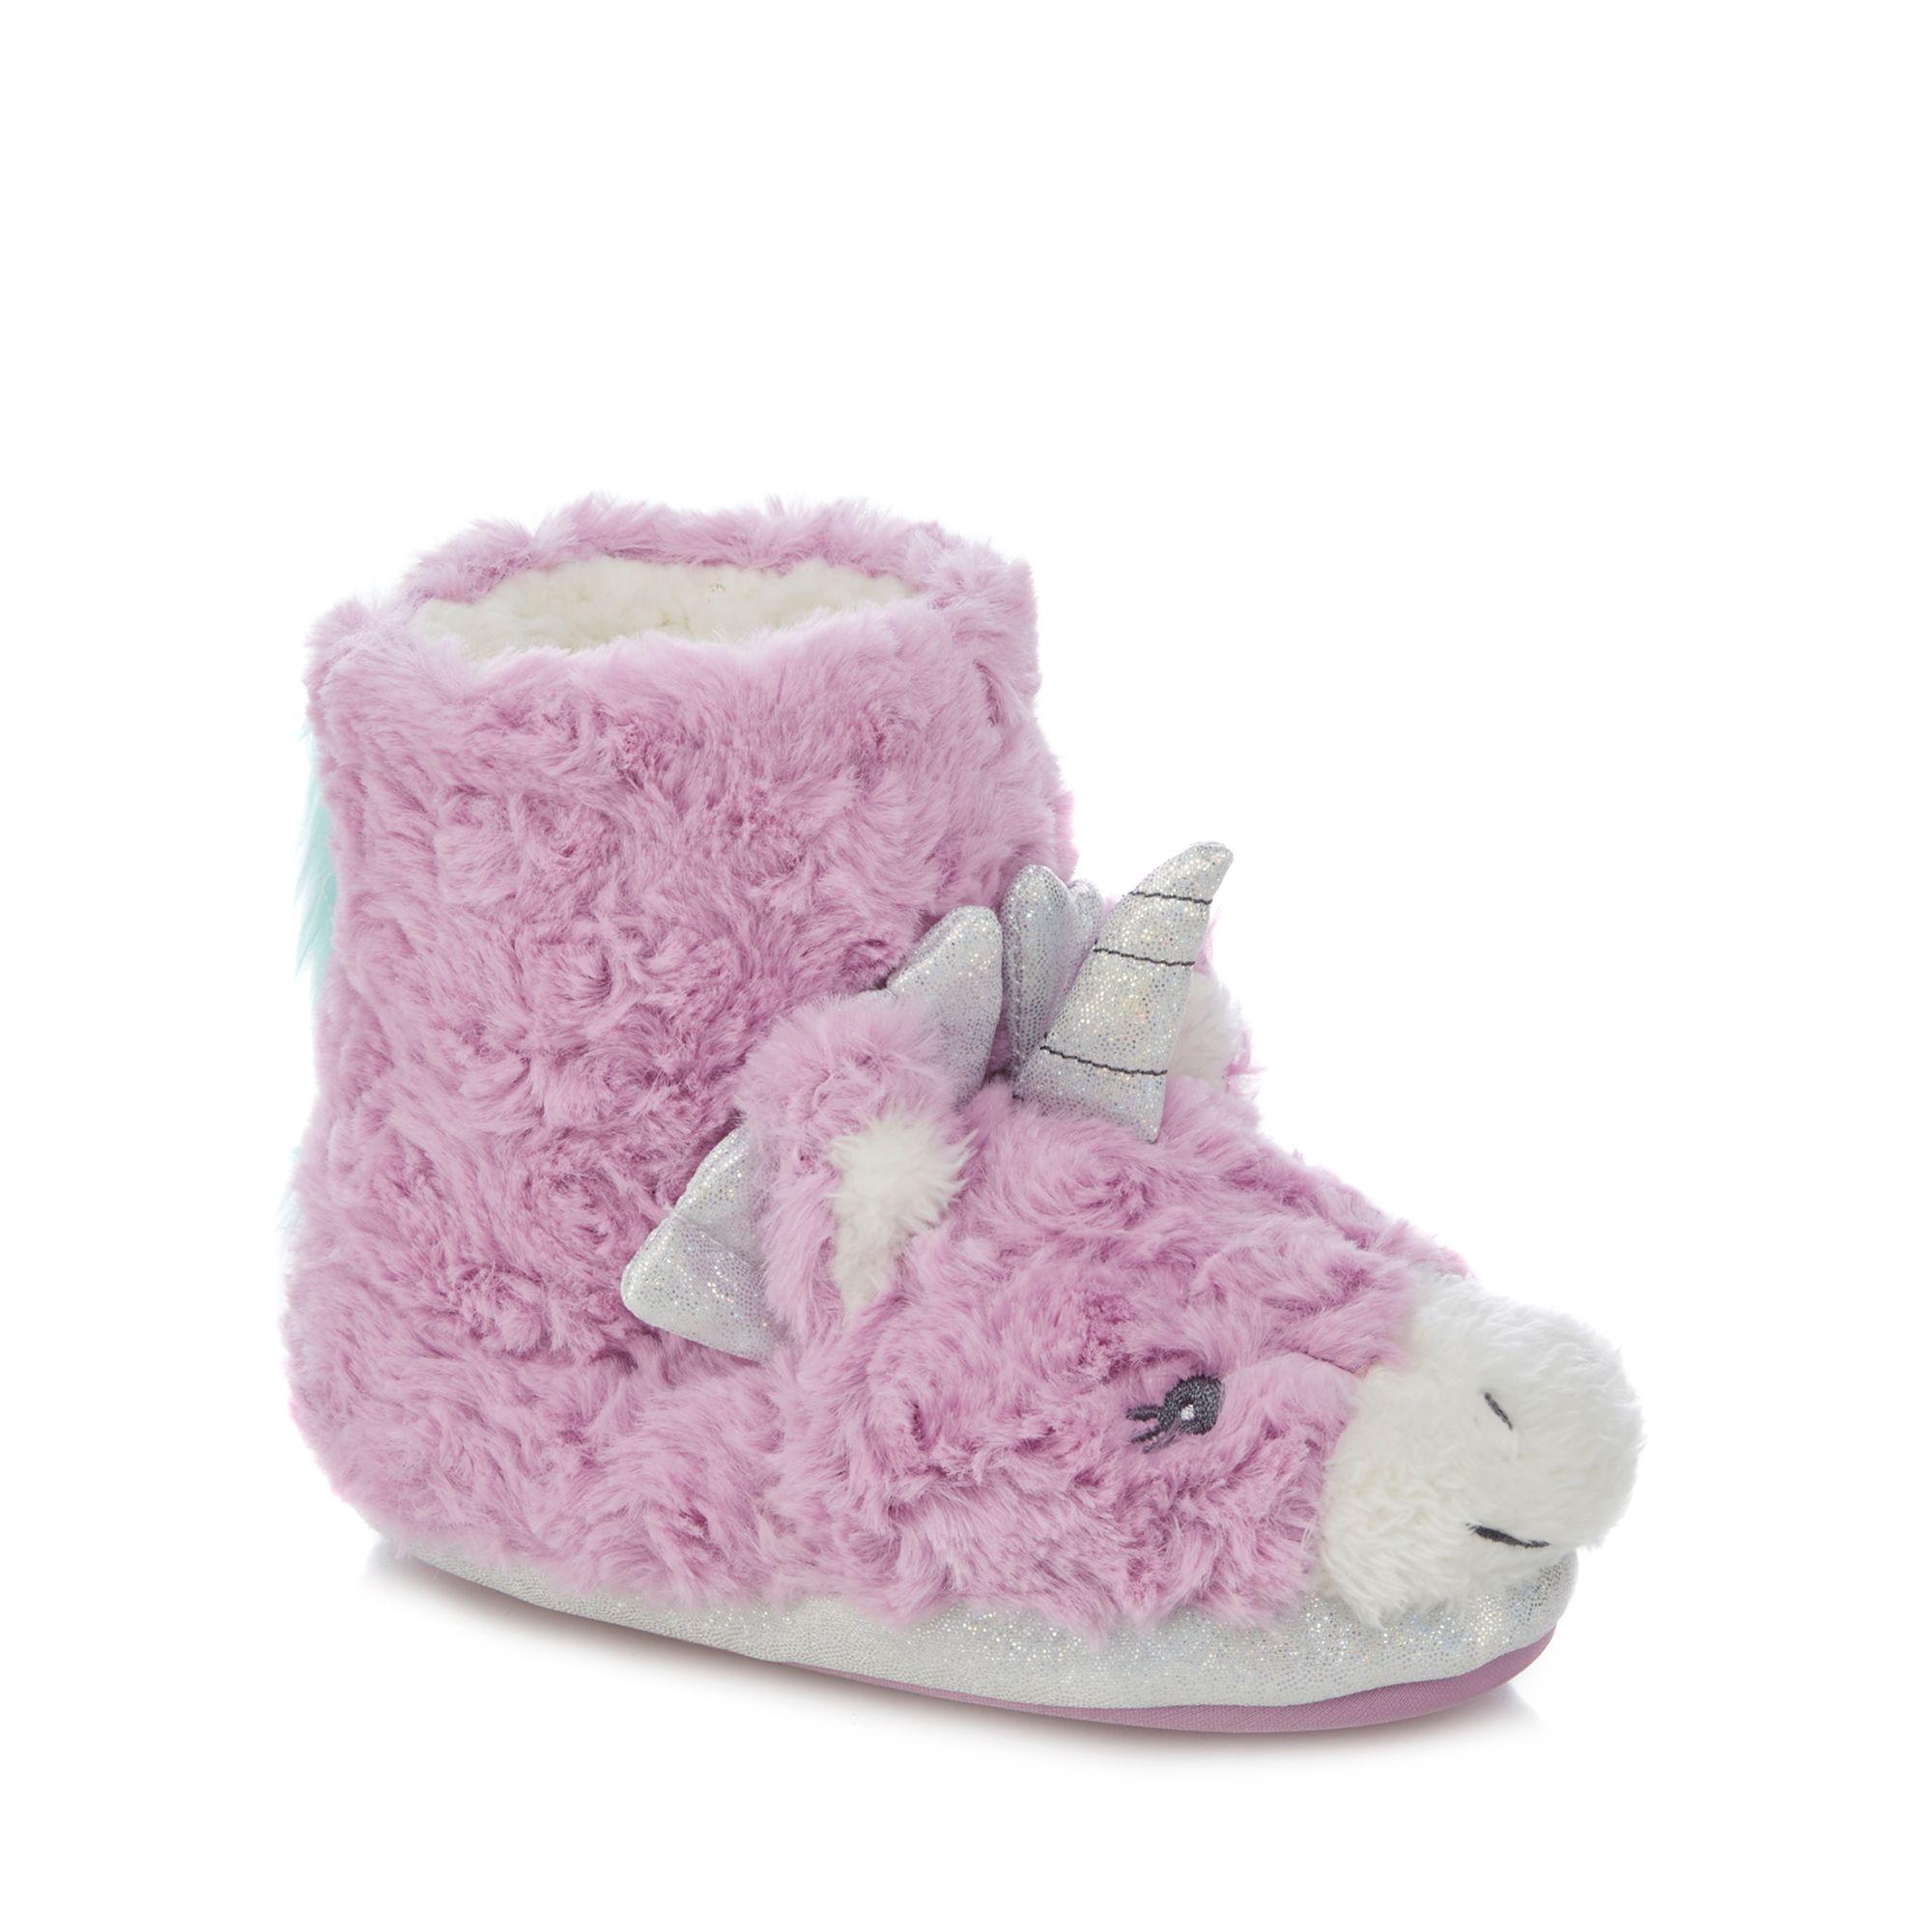 Bluezoo Kids Girls Lilac Faux Fur Unicorn Slippers From Debenhams